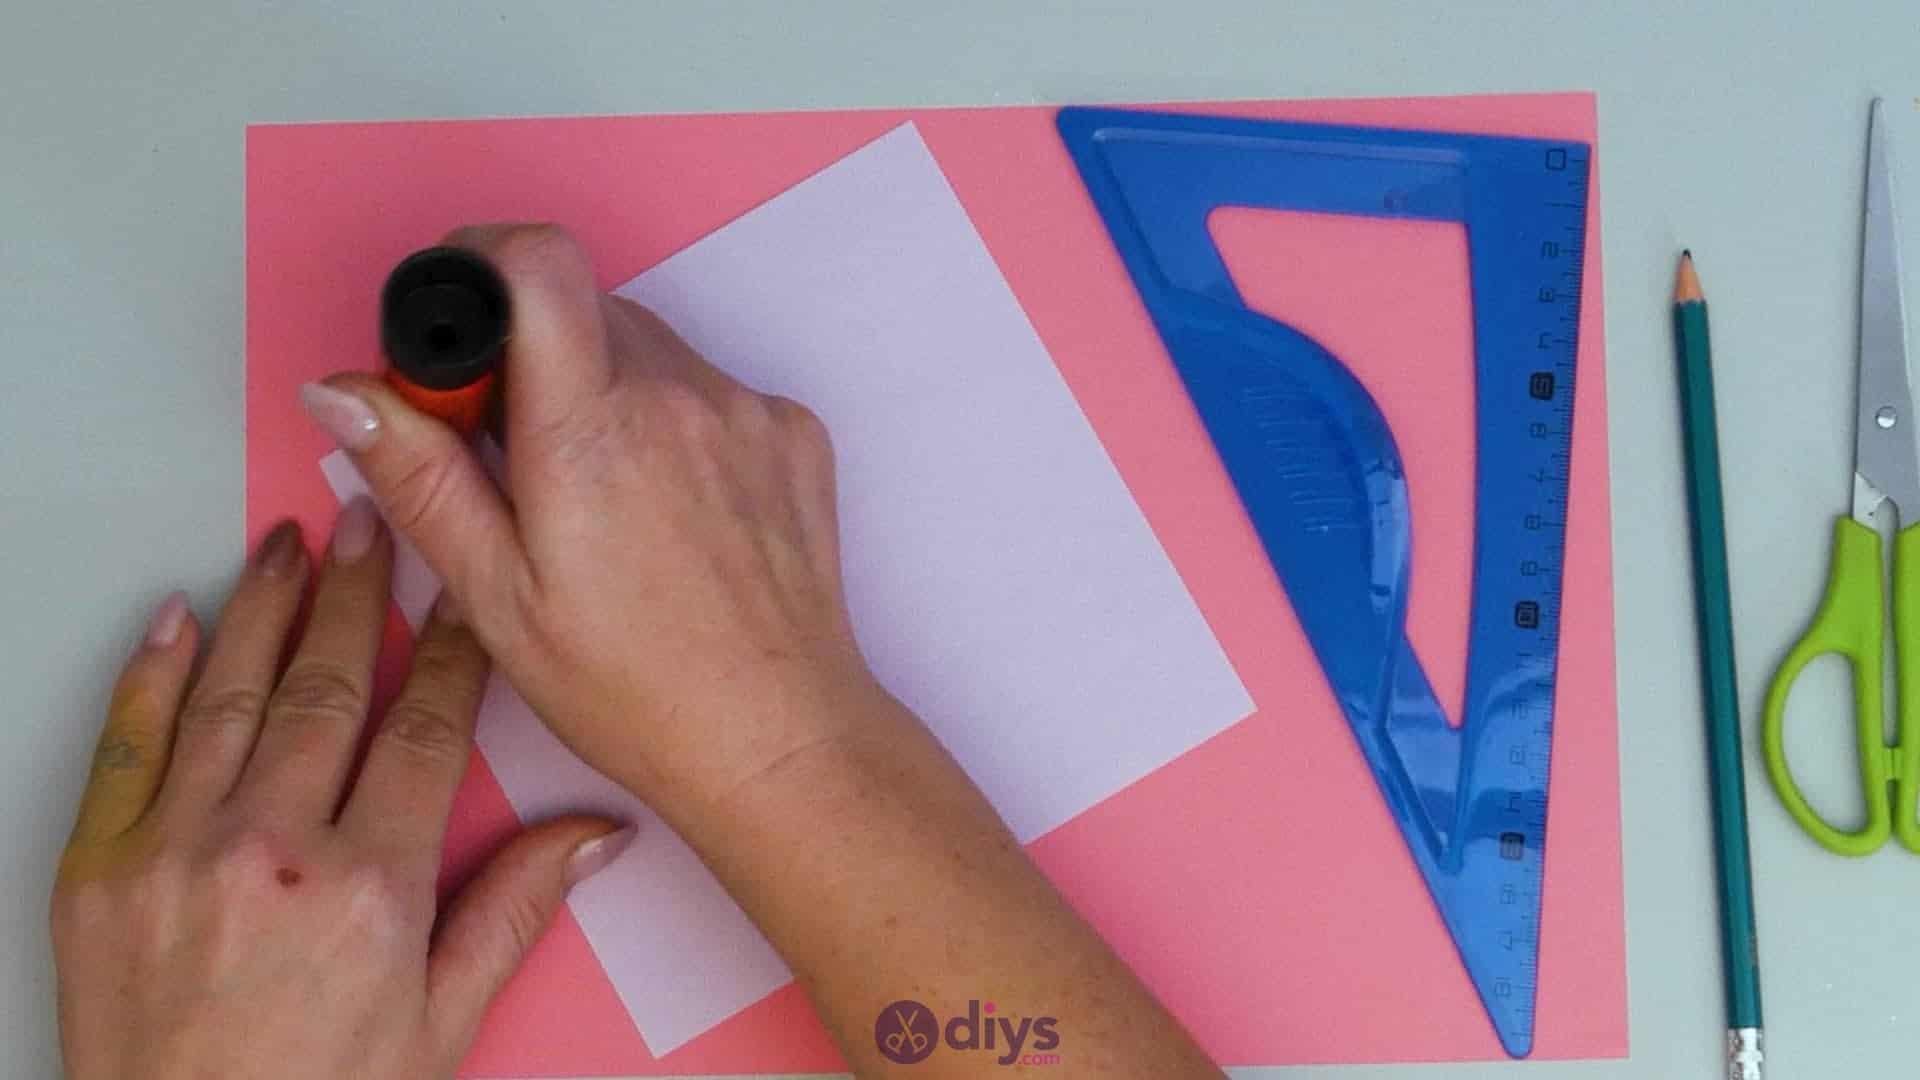 Diy lipstick gift card step 2